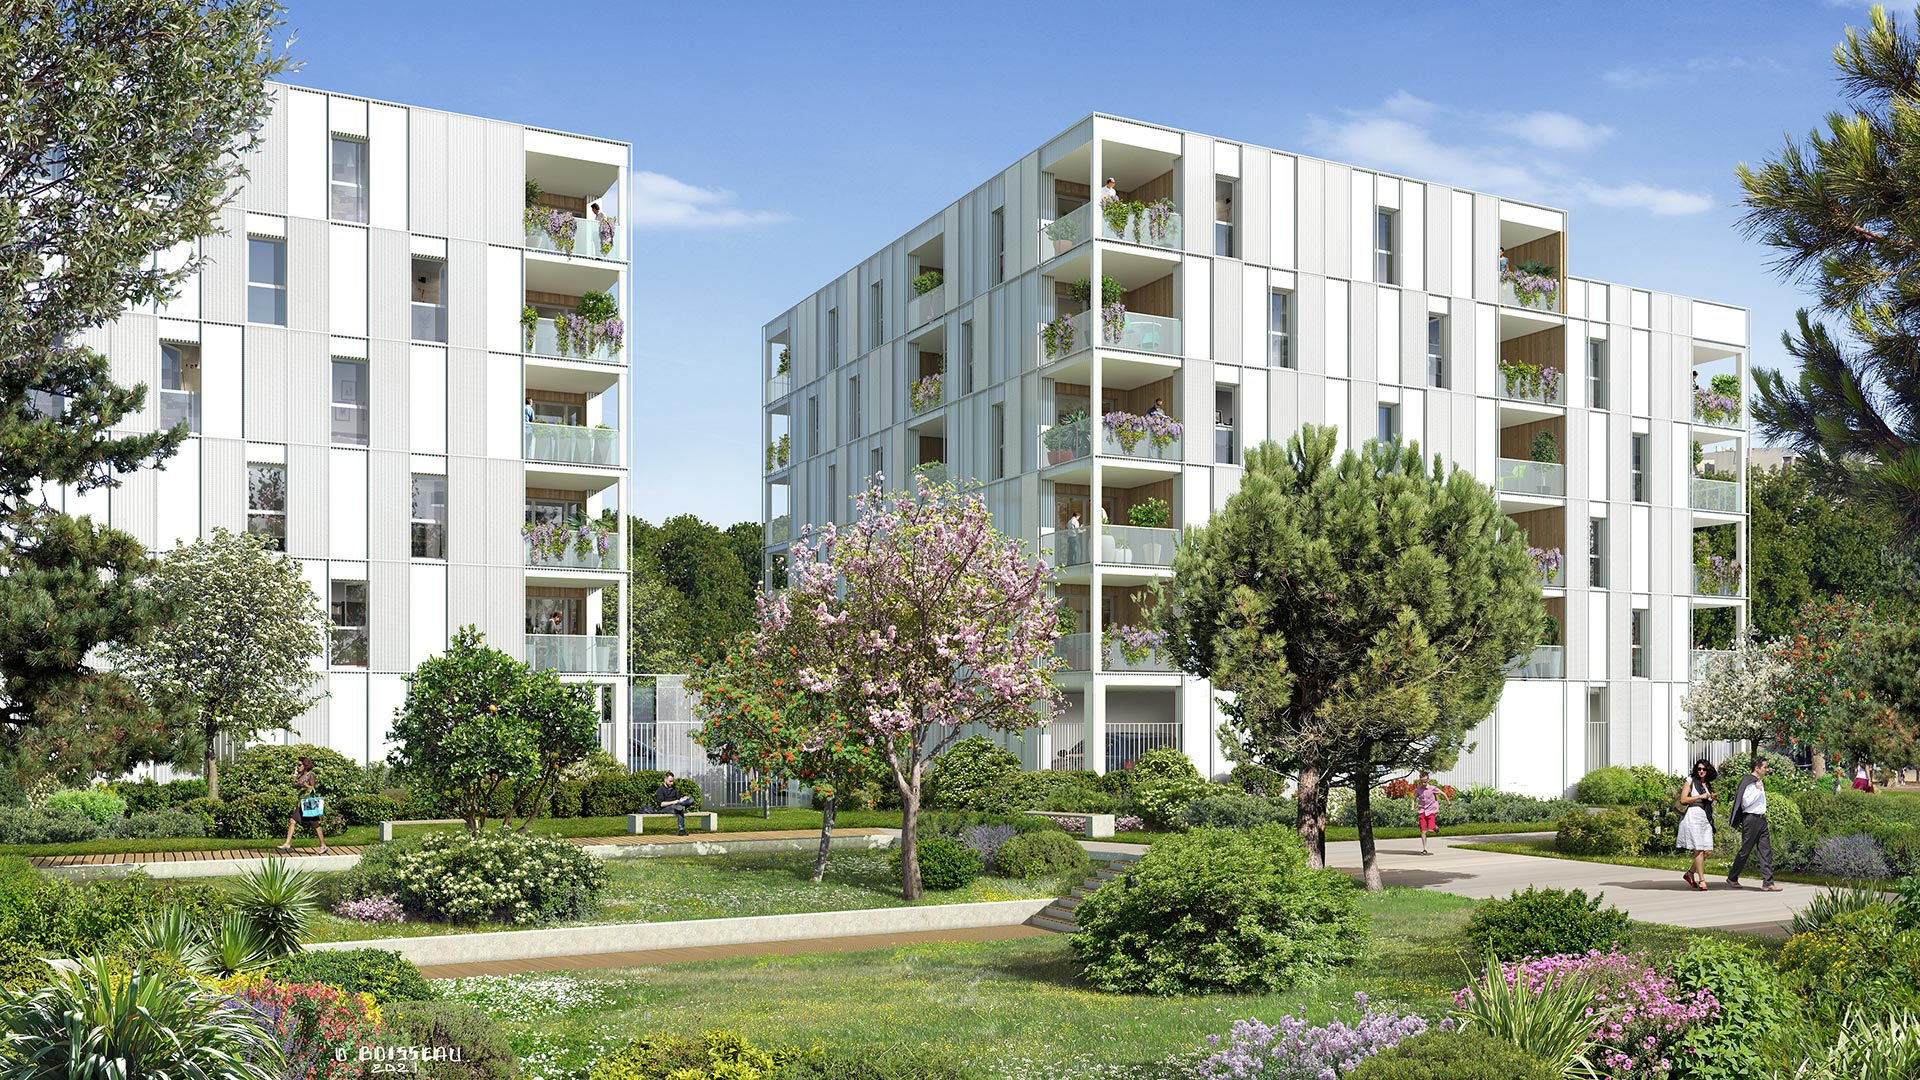 https://www.kaufmanbroad.fr/sites/default/files/programmes/55041/programme-immobilier-neuf-prochainement-lagord-1_1.jpg